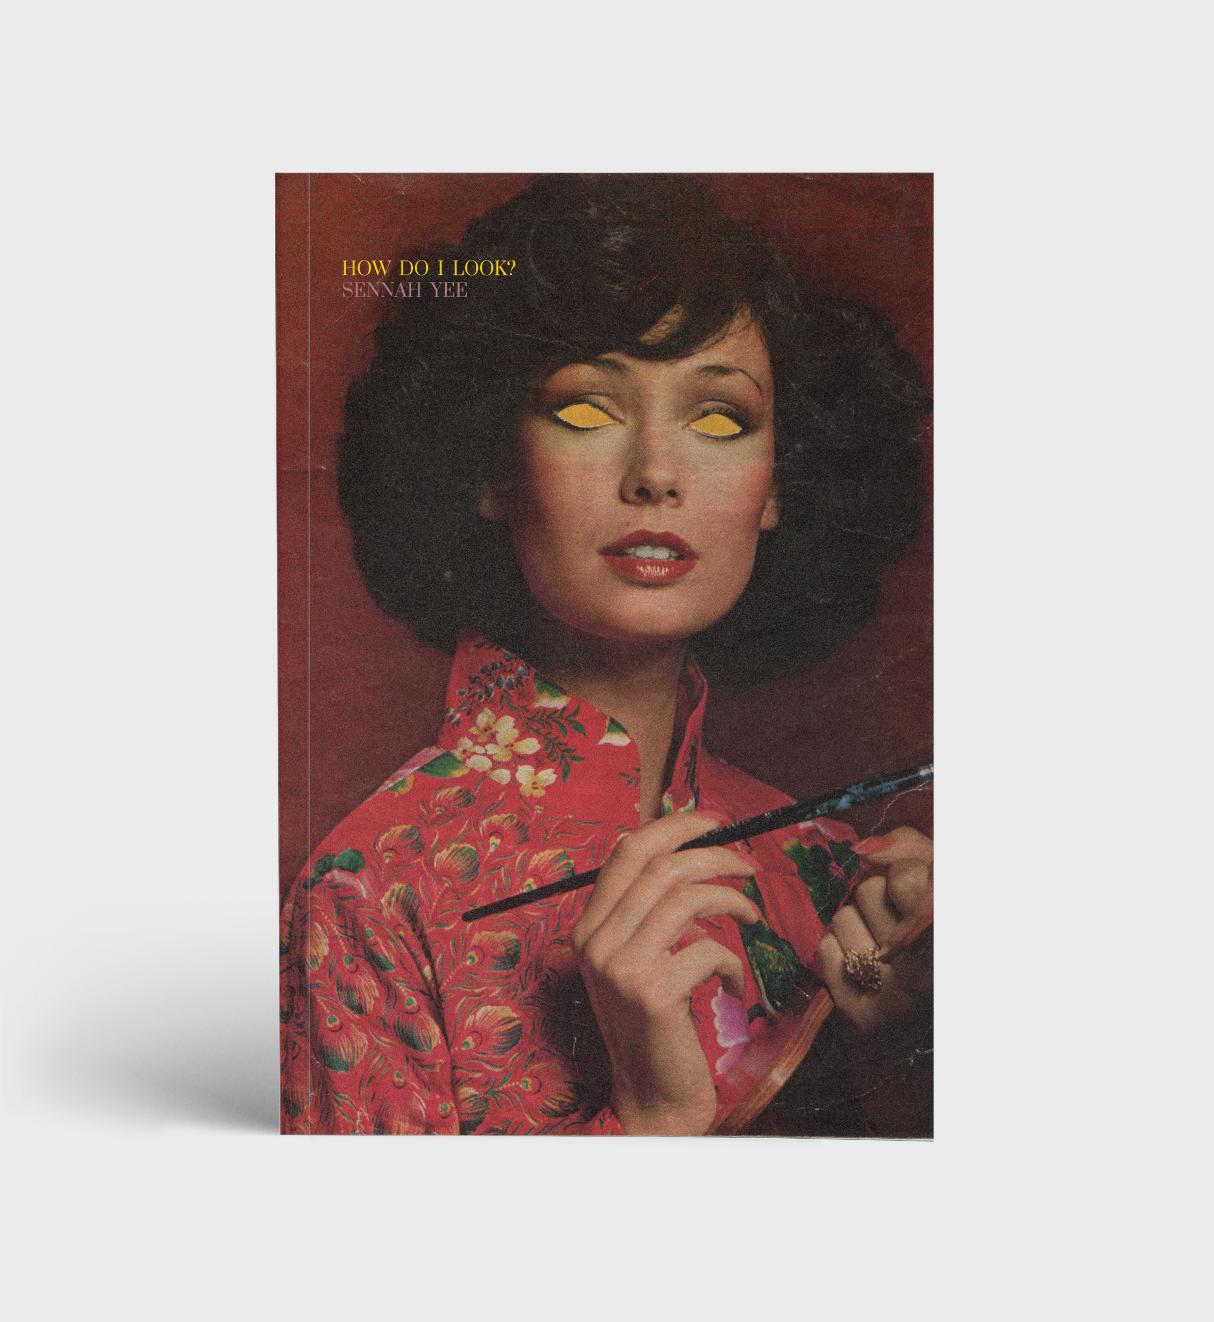 -Sennah Yee - How Do I Look book cover - Sennah Yee.jpg